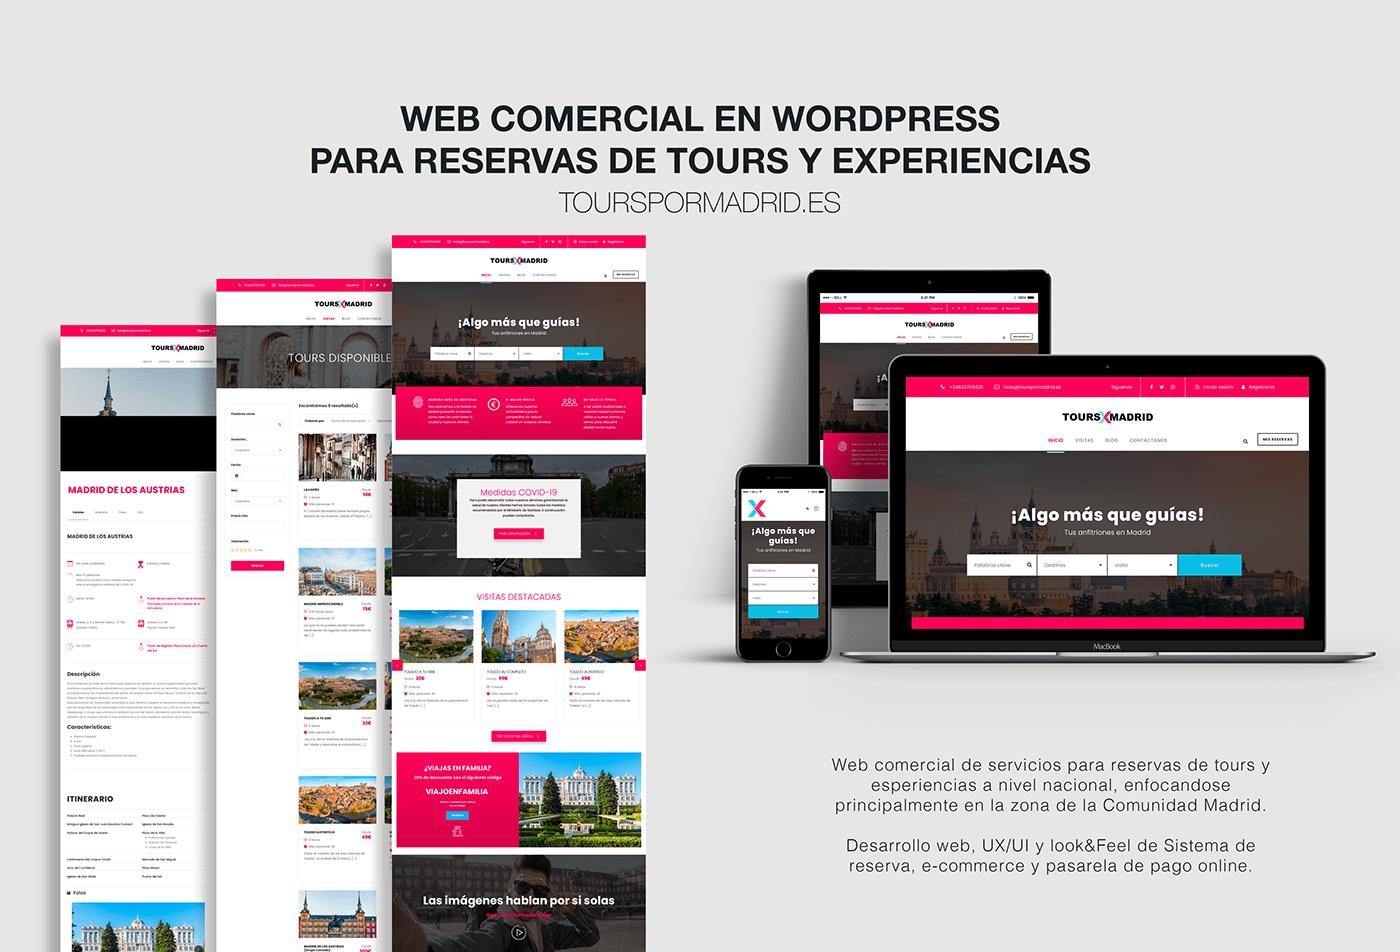 desarrollo design developer diseño gráfico Ecommerce front-end UI ux Web wordpress